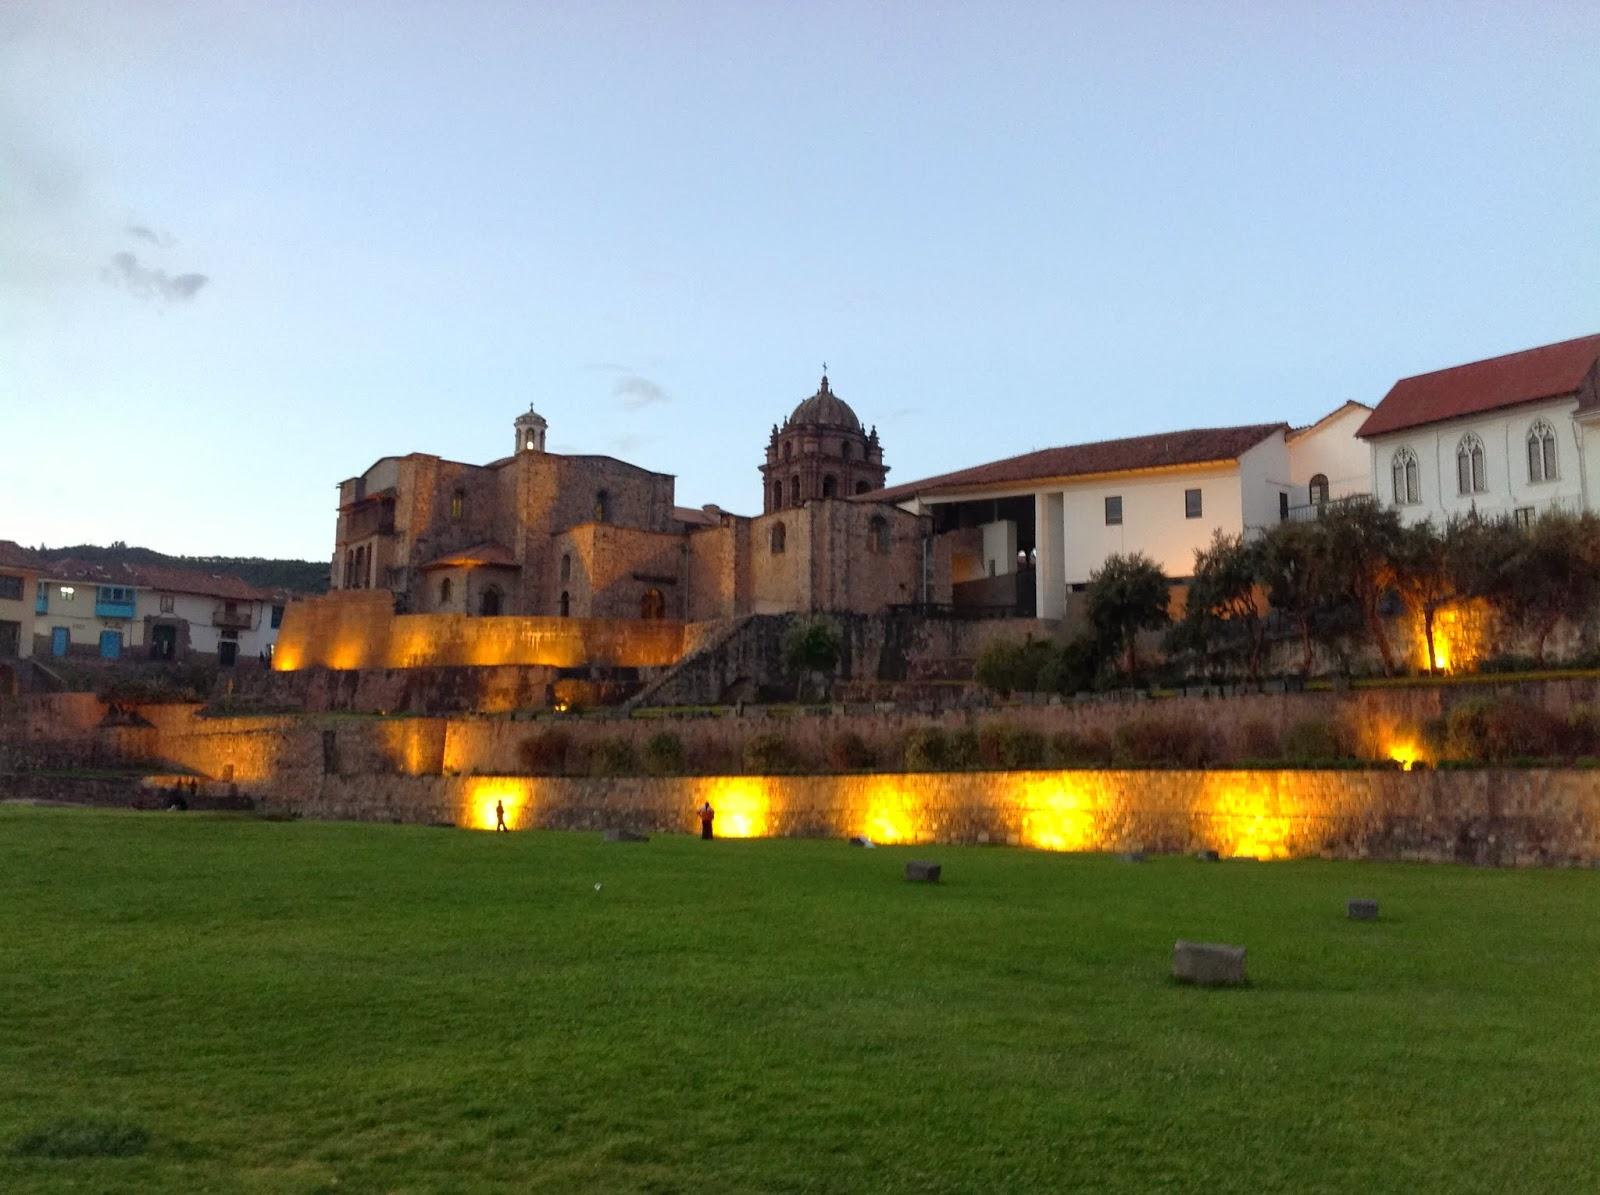 KORICANCHA, RUMICOLCA, ANDAHUAYLILLAS, PIKILLACTA, TIPÓN - Cusco, Peru